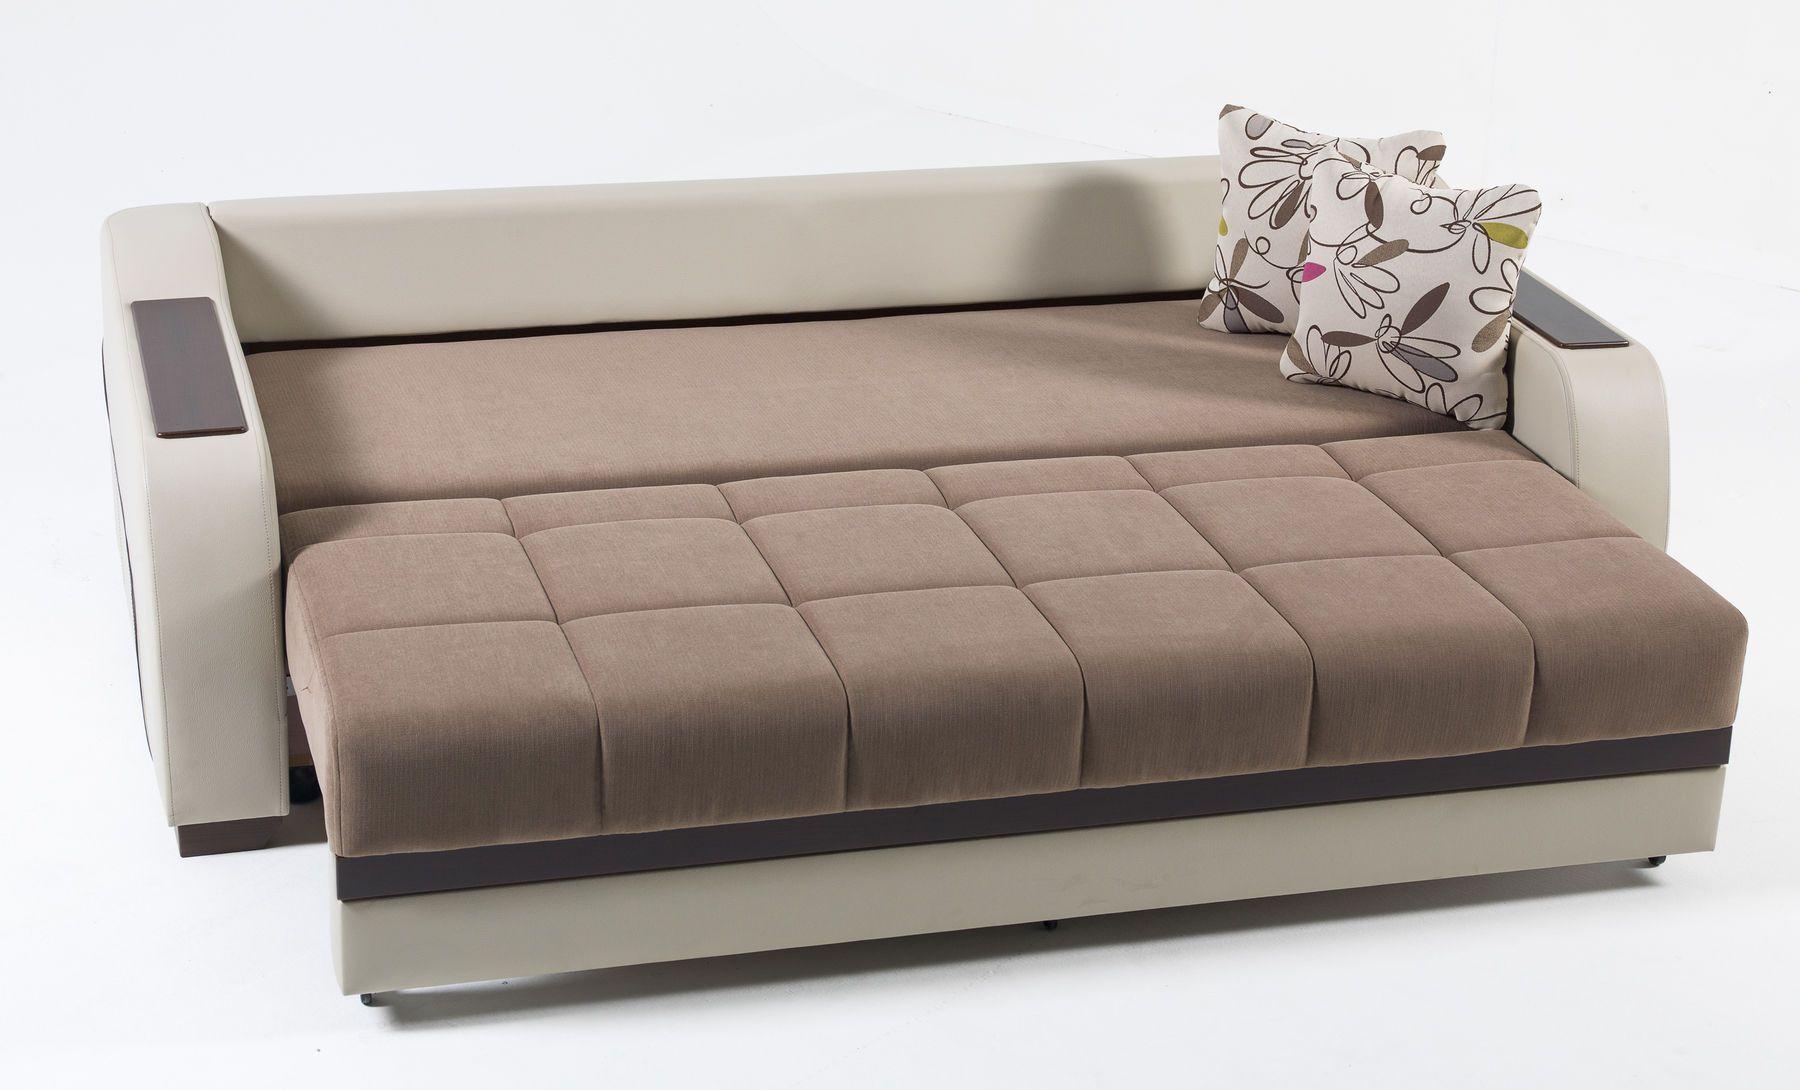 Ultra Brown Sofa Ultra S 20209 Istikbal Fabric Sofas In 2020 Modern Sleeper Sofa Best Sleeper Sofa Sofa Bed Queen